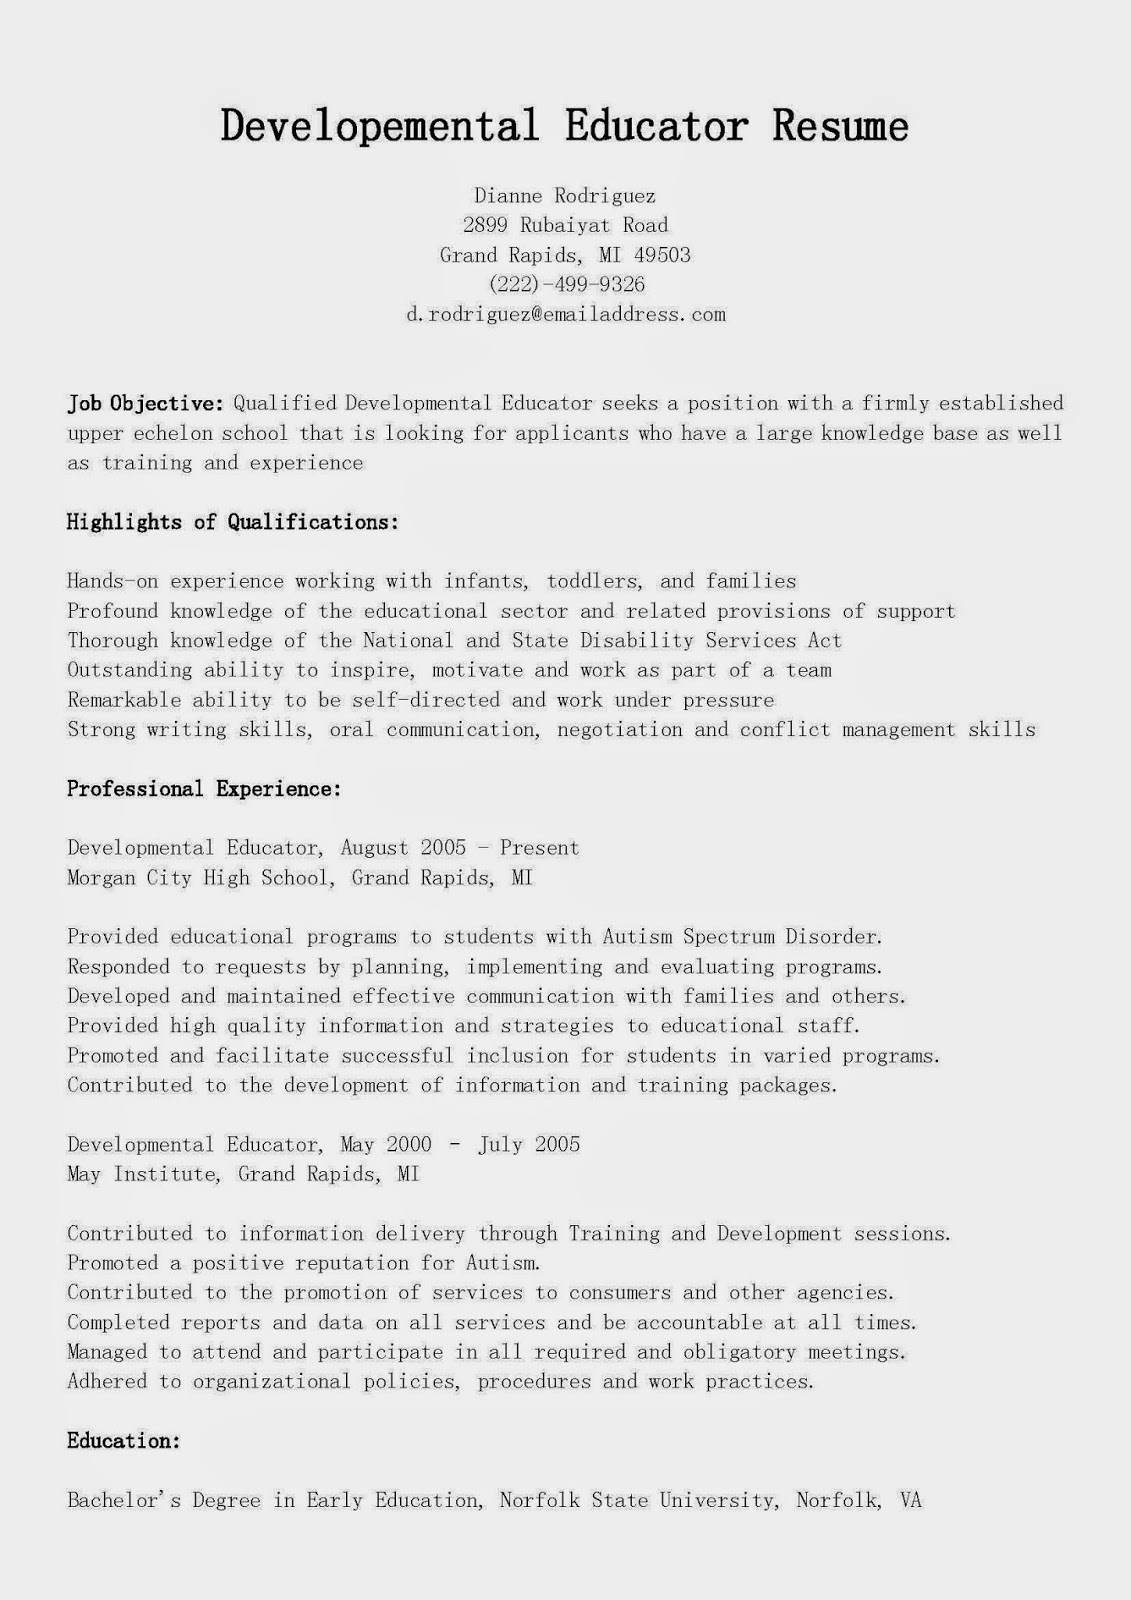 resume samples  developemental educator resume sample